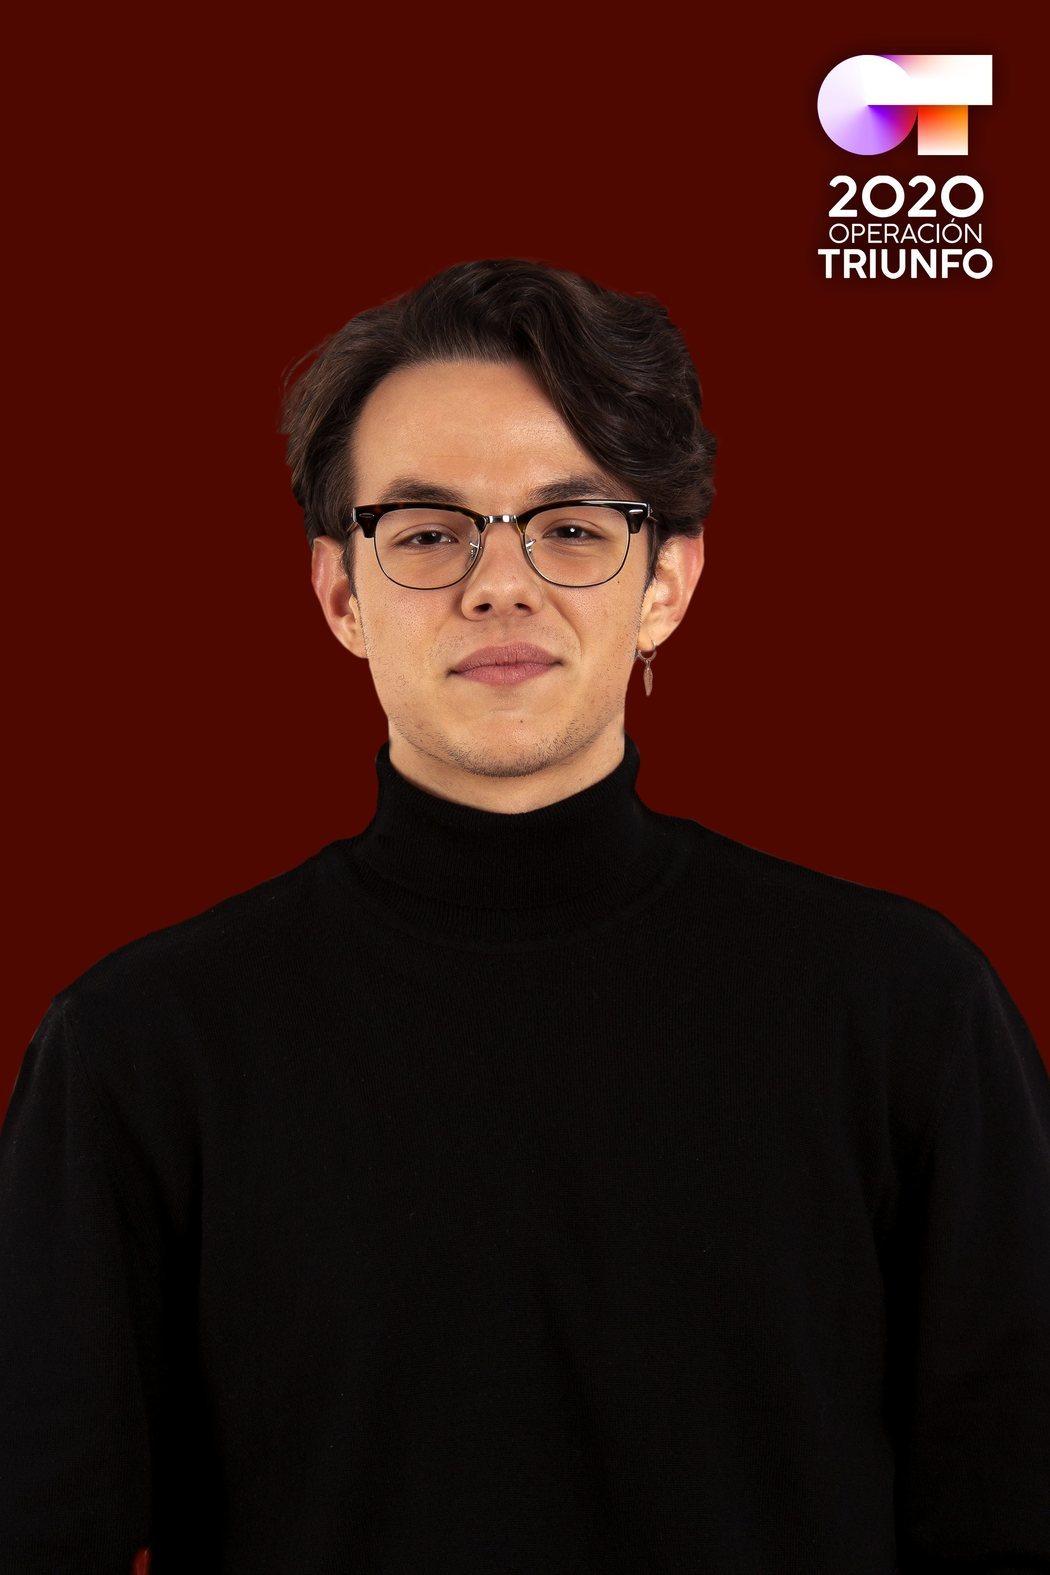 Flavio Fernández, concursante de 'OT 2020'